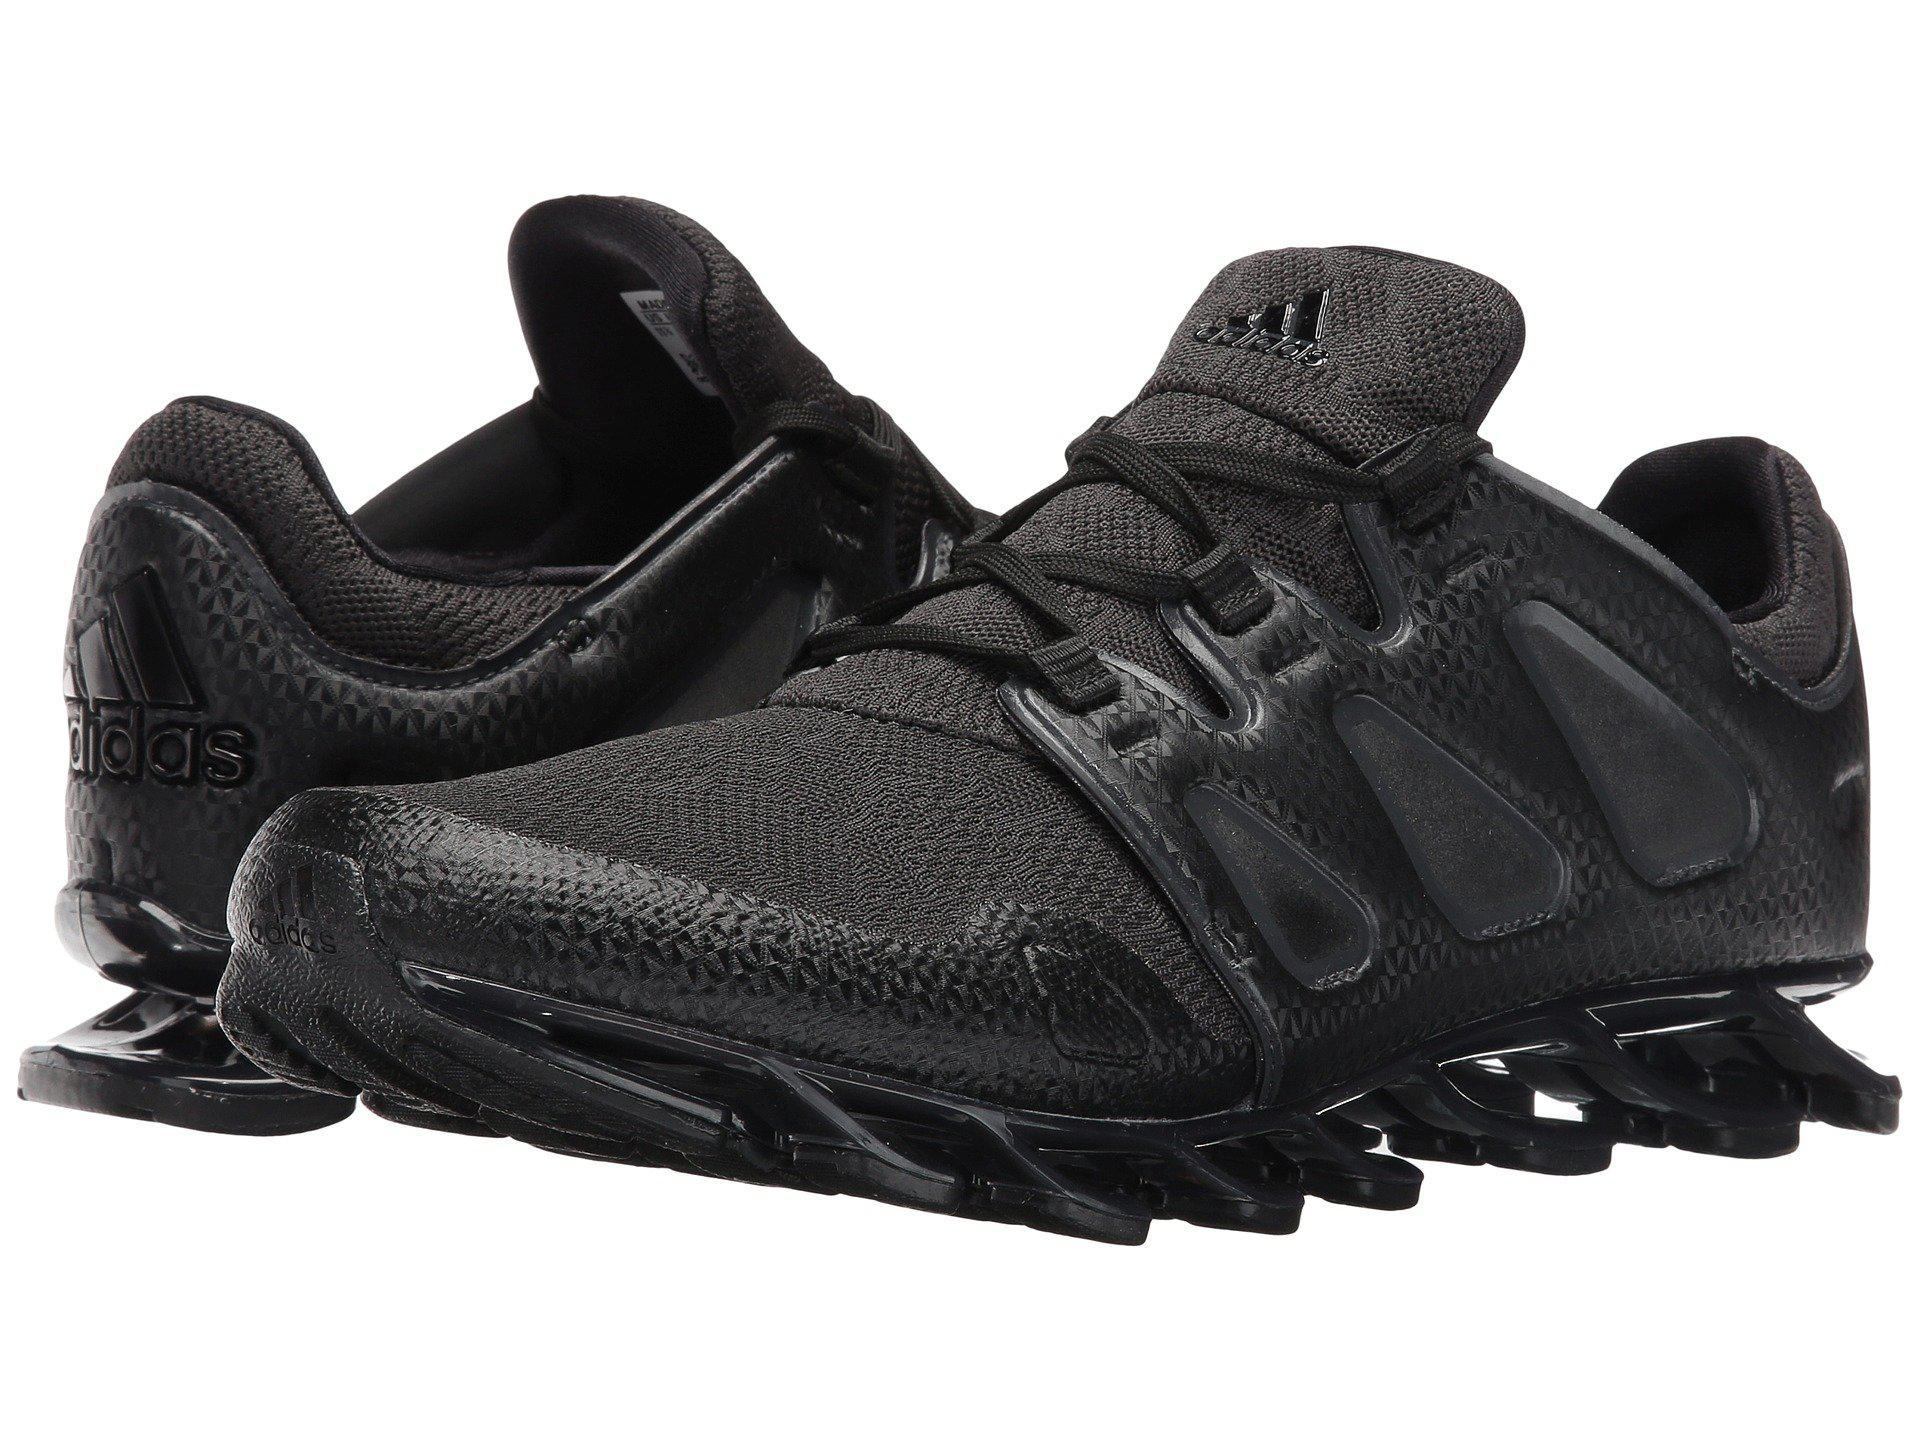 wholesale dealer 9e4a4 da9e1 ... grey silvmt and cblack running shoes 11 uk 66c3e 2e85e  get lyst adidas  springblade pro m in black for men 112e0 43fc3